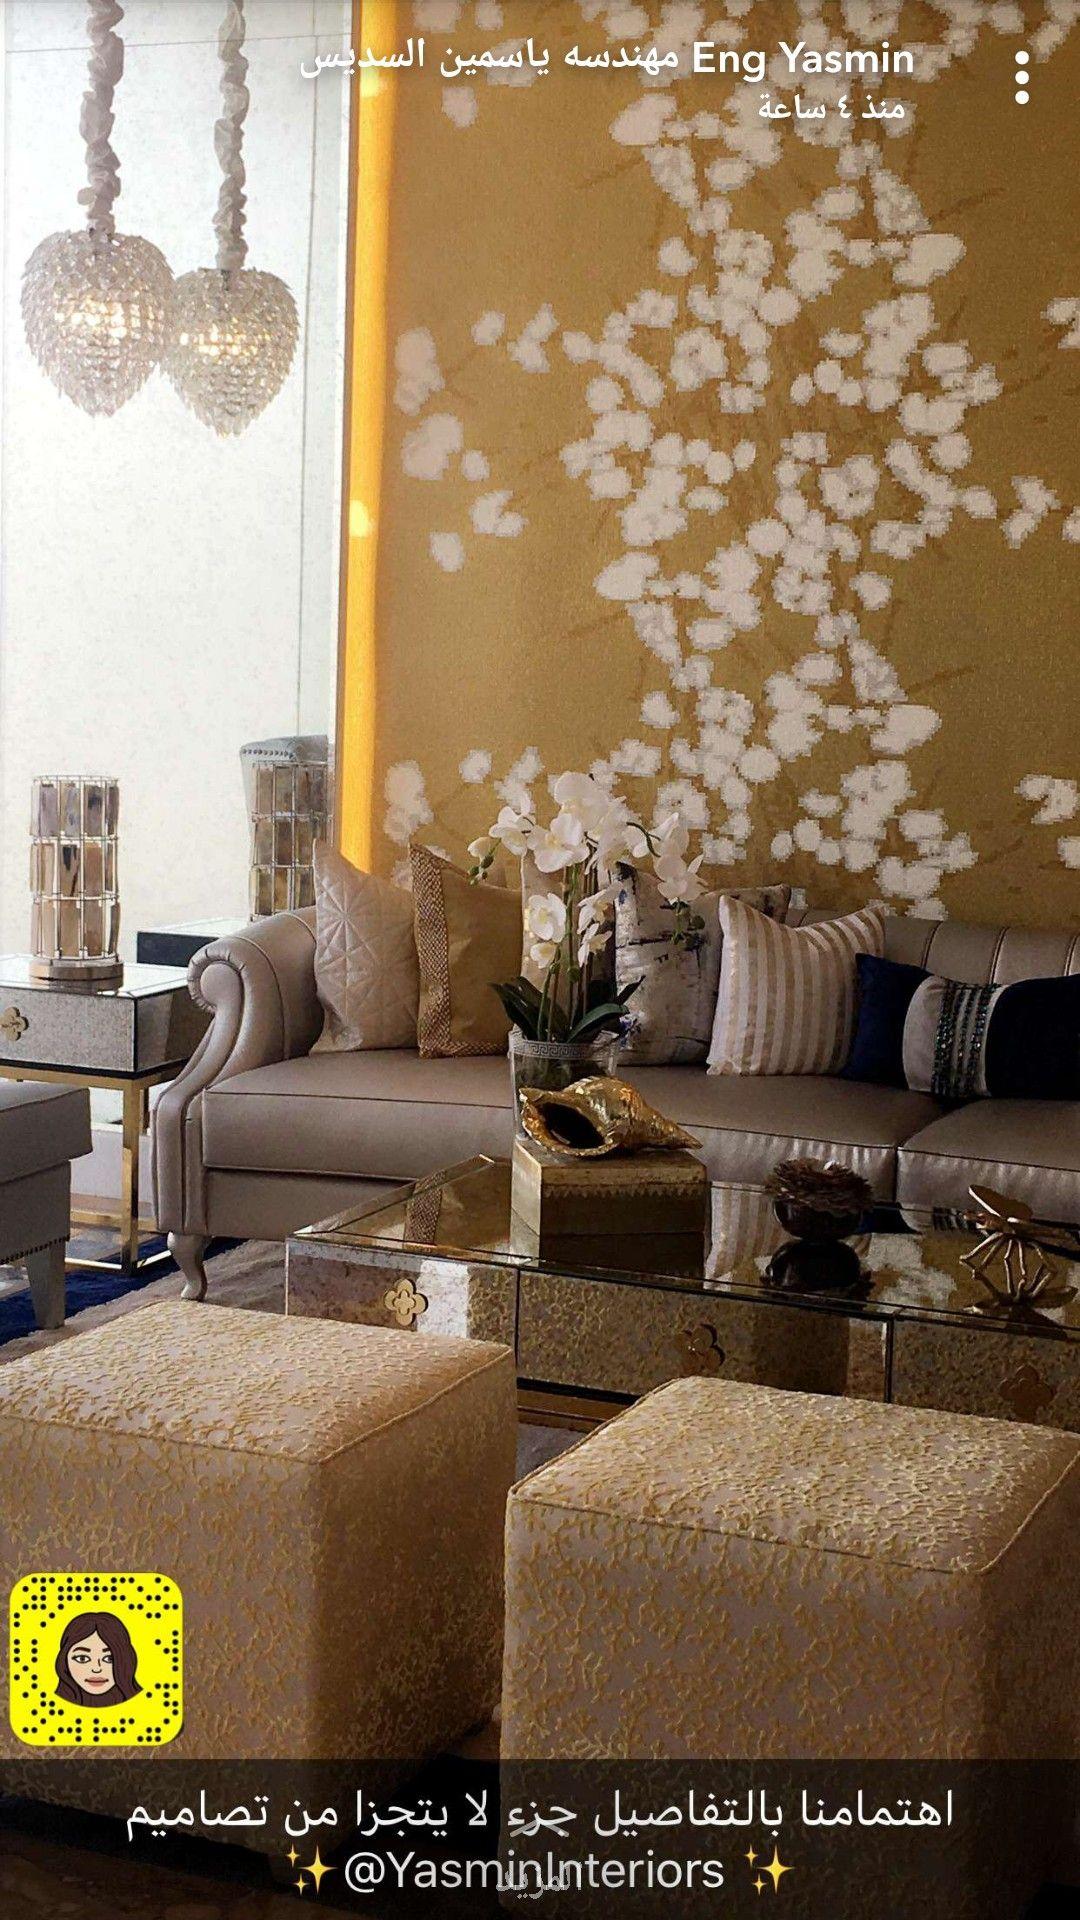 Pin By Smsm On مجالس Living Room Decor Modern Interior Wall Design Living Room Designs